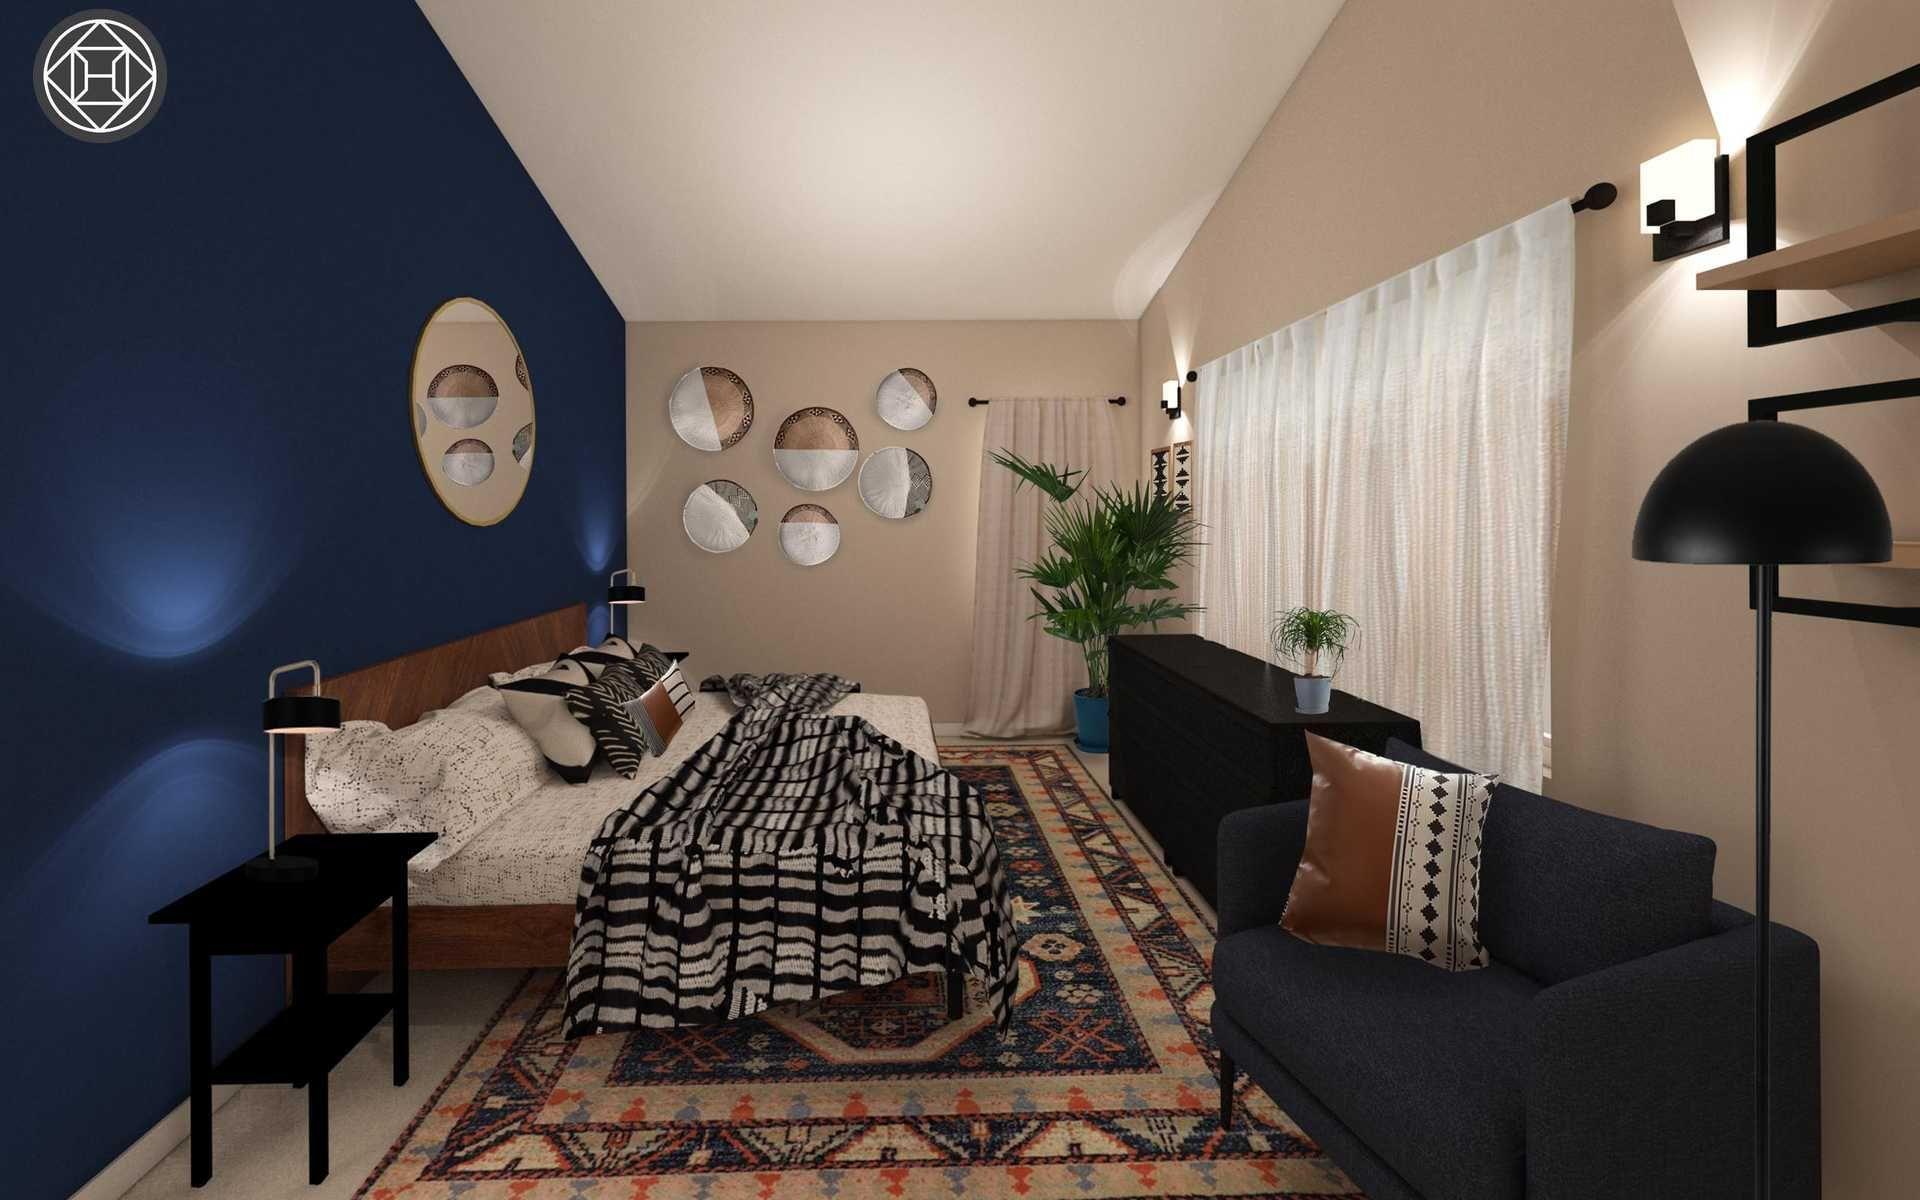 Contemporary Bohemian Midcentury Modern Bedroom Design By Havenly Interior Designer Sharon Modern Room Design Modern Bedroom Design Interior Design